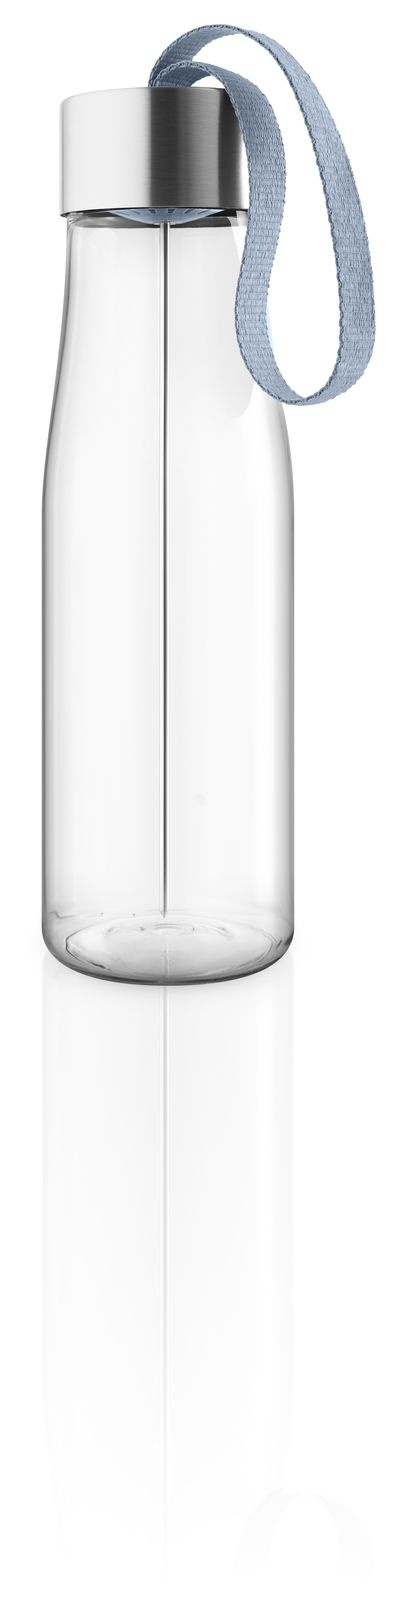 Eva Solo Drinkfles MyFlavour 750 ml